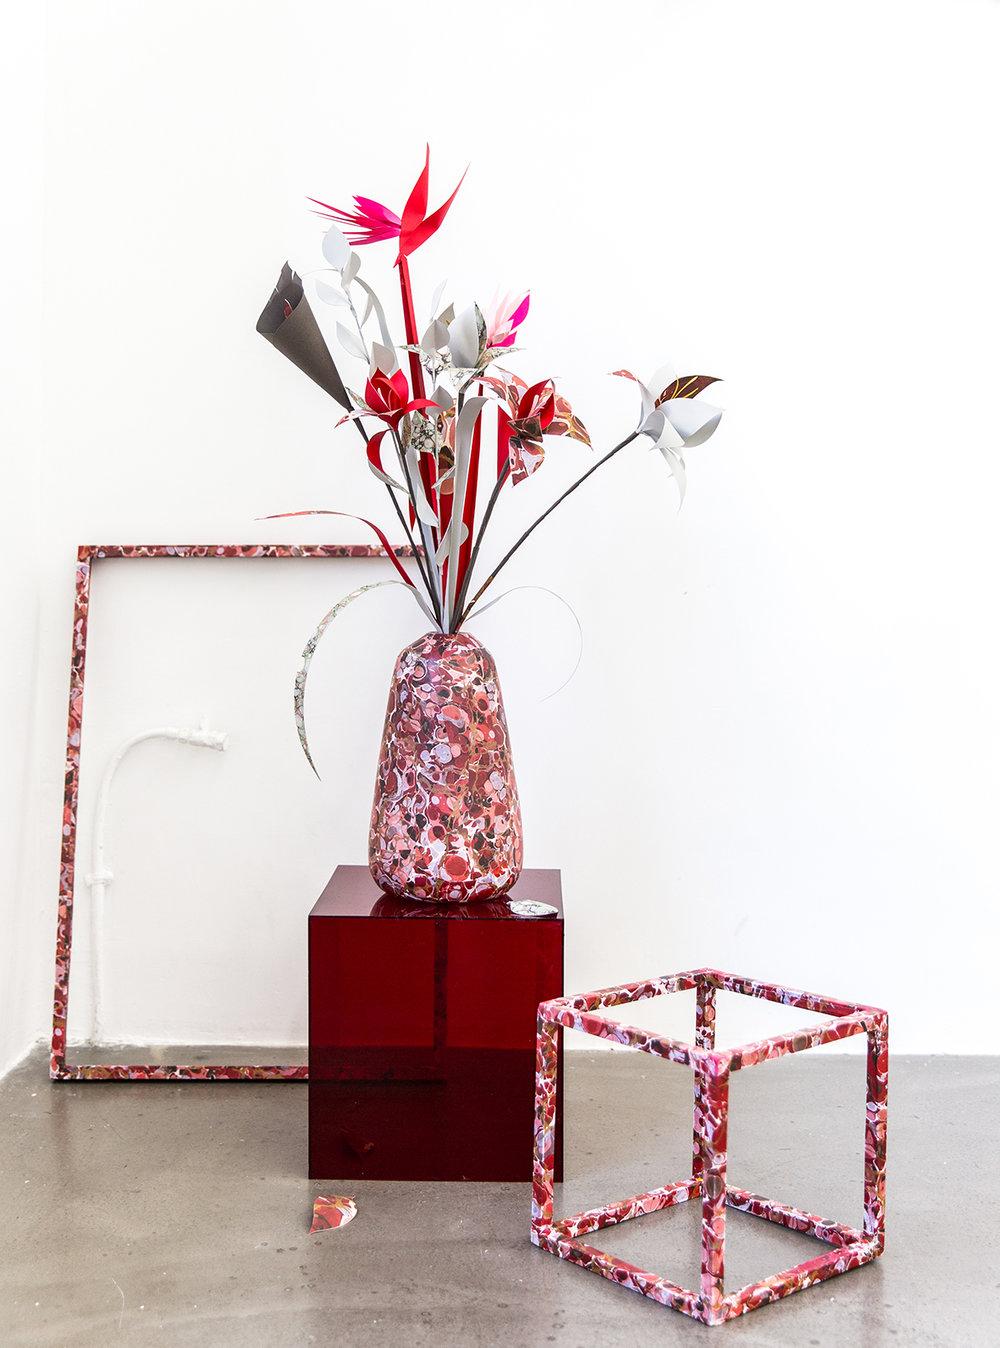 present-gallerie-lartisanparfumeur-1.jpg